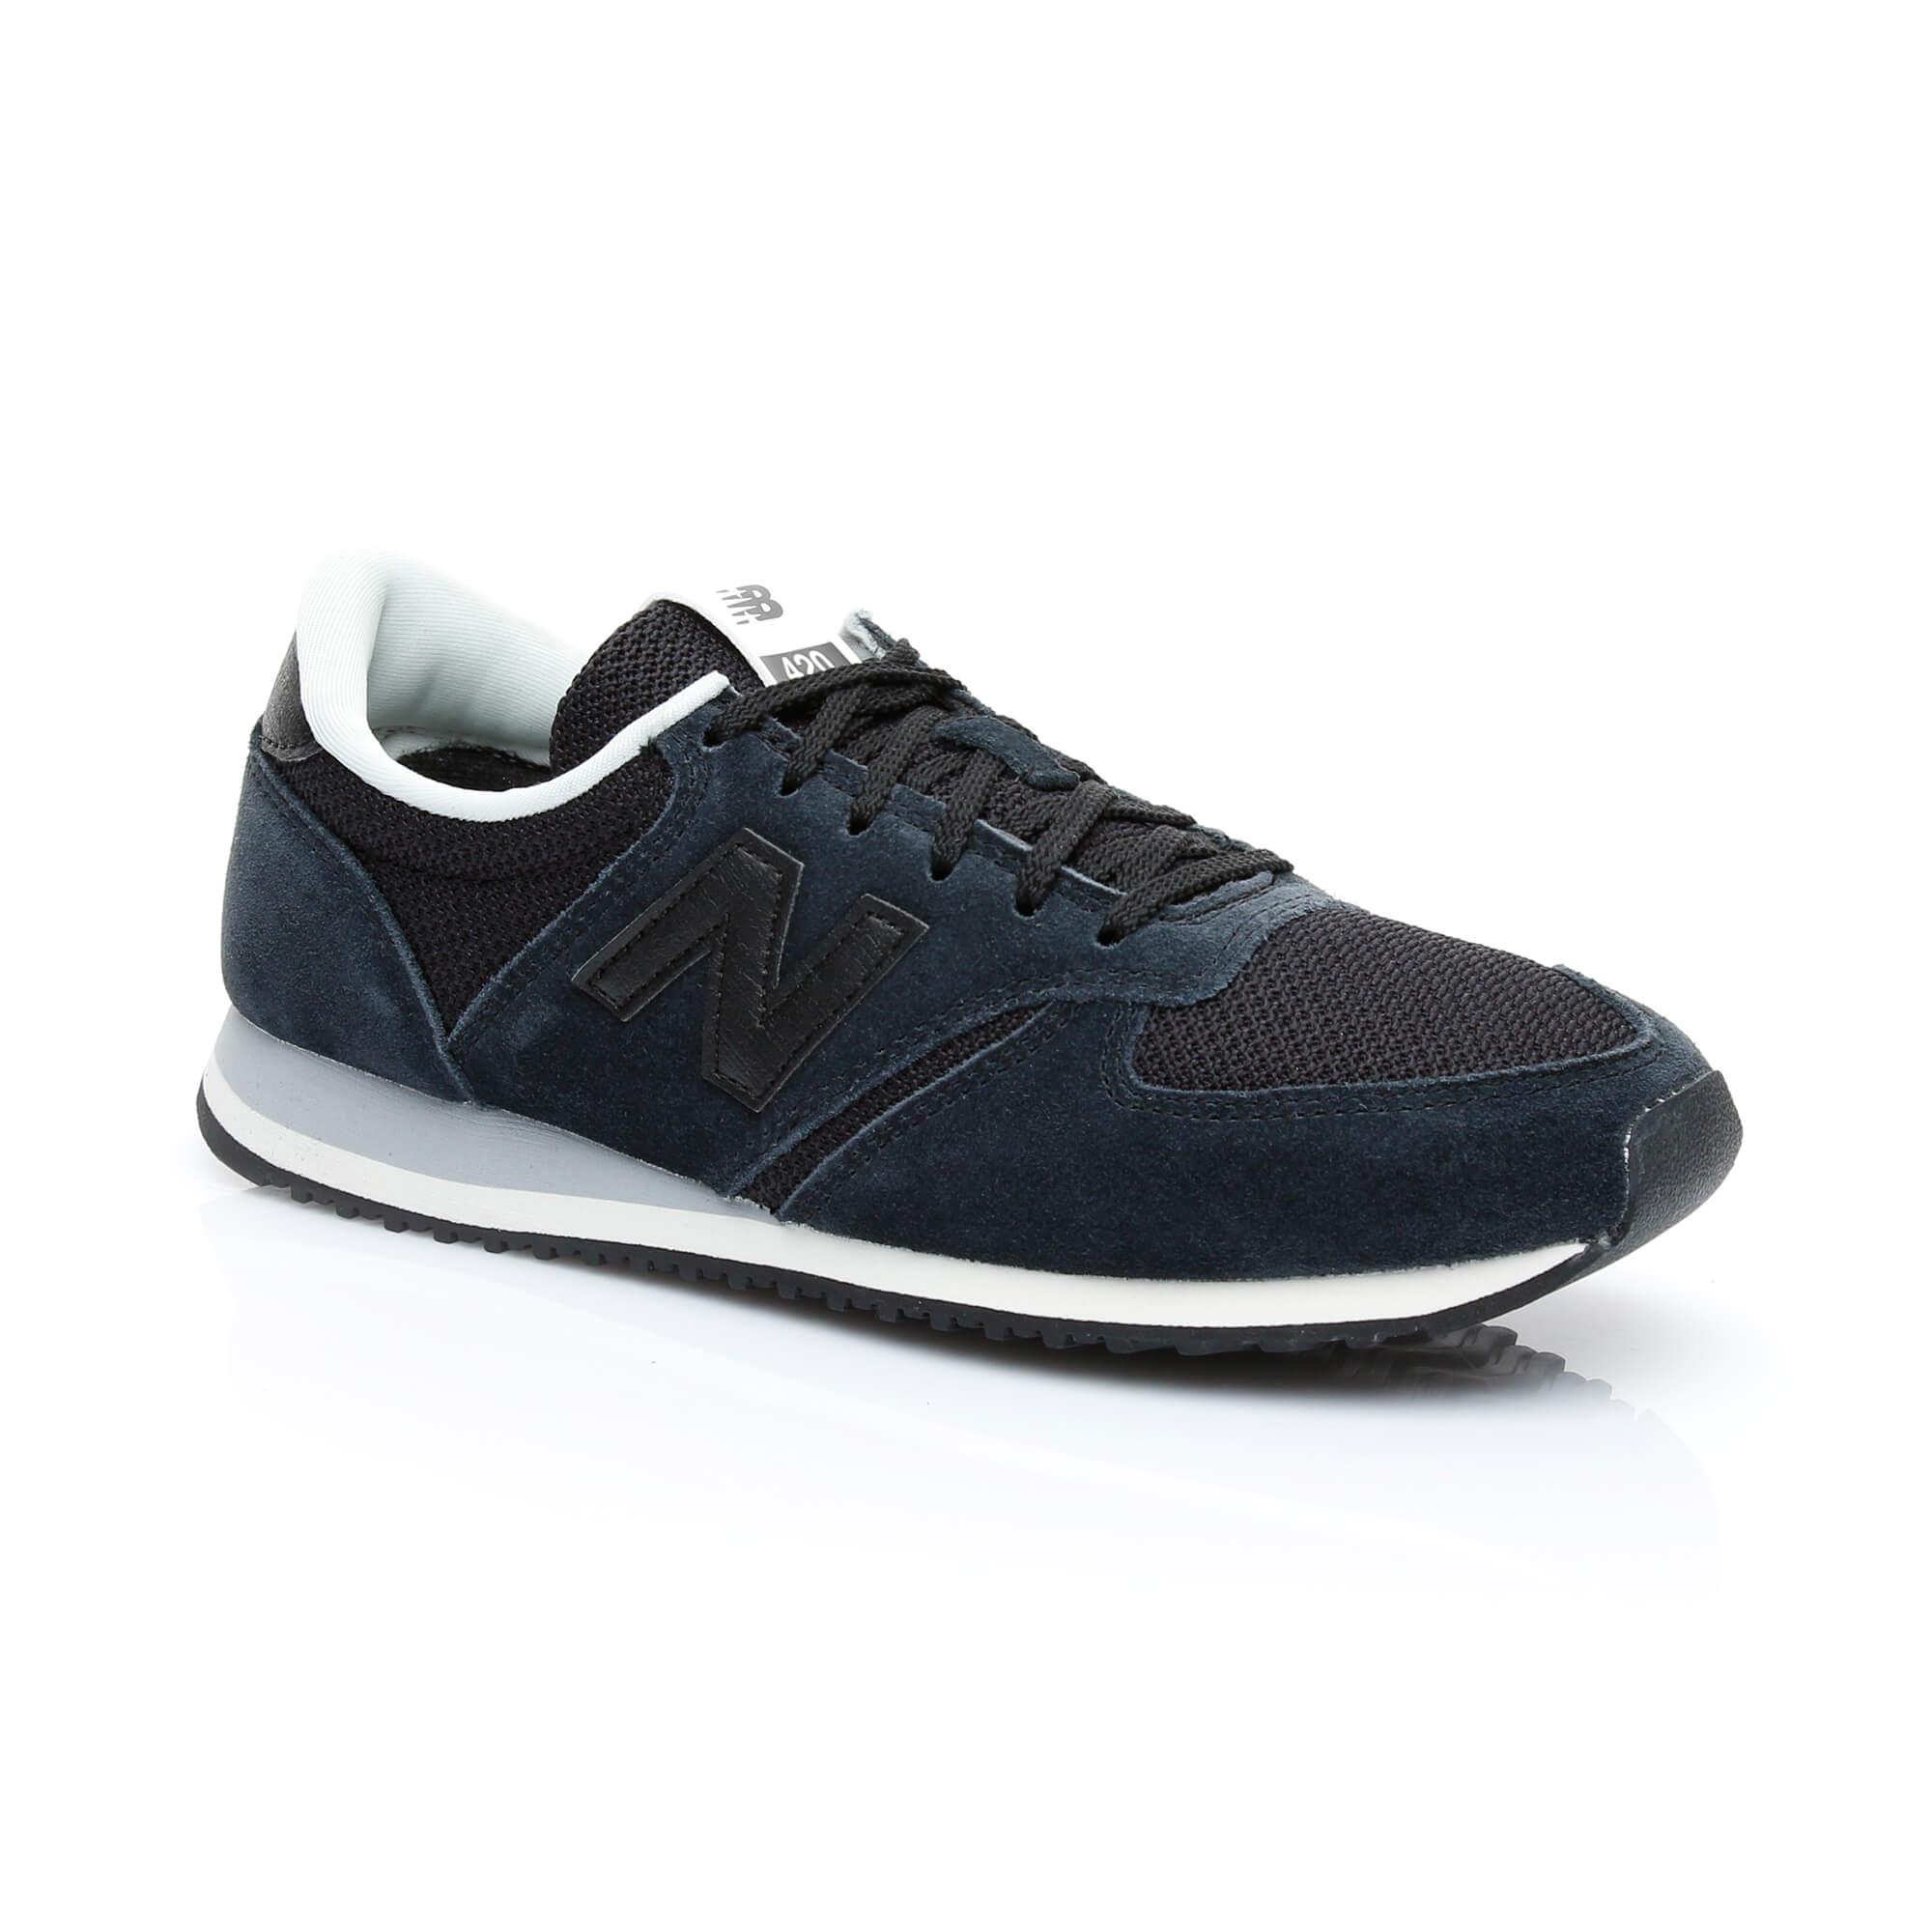 New Balance Wl420Nbc Kadın Siyah Sneakers